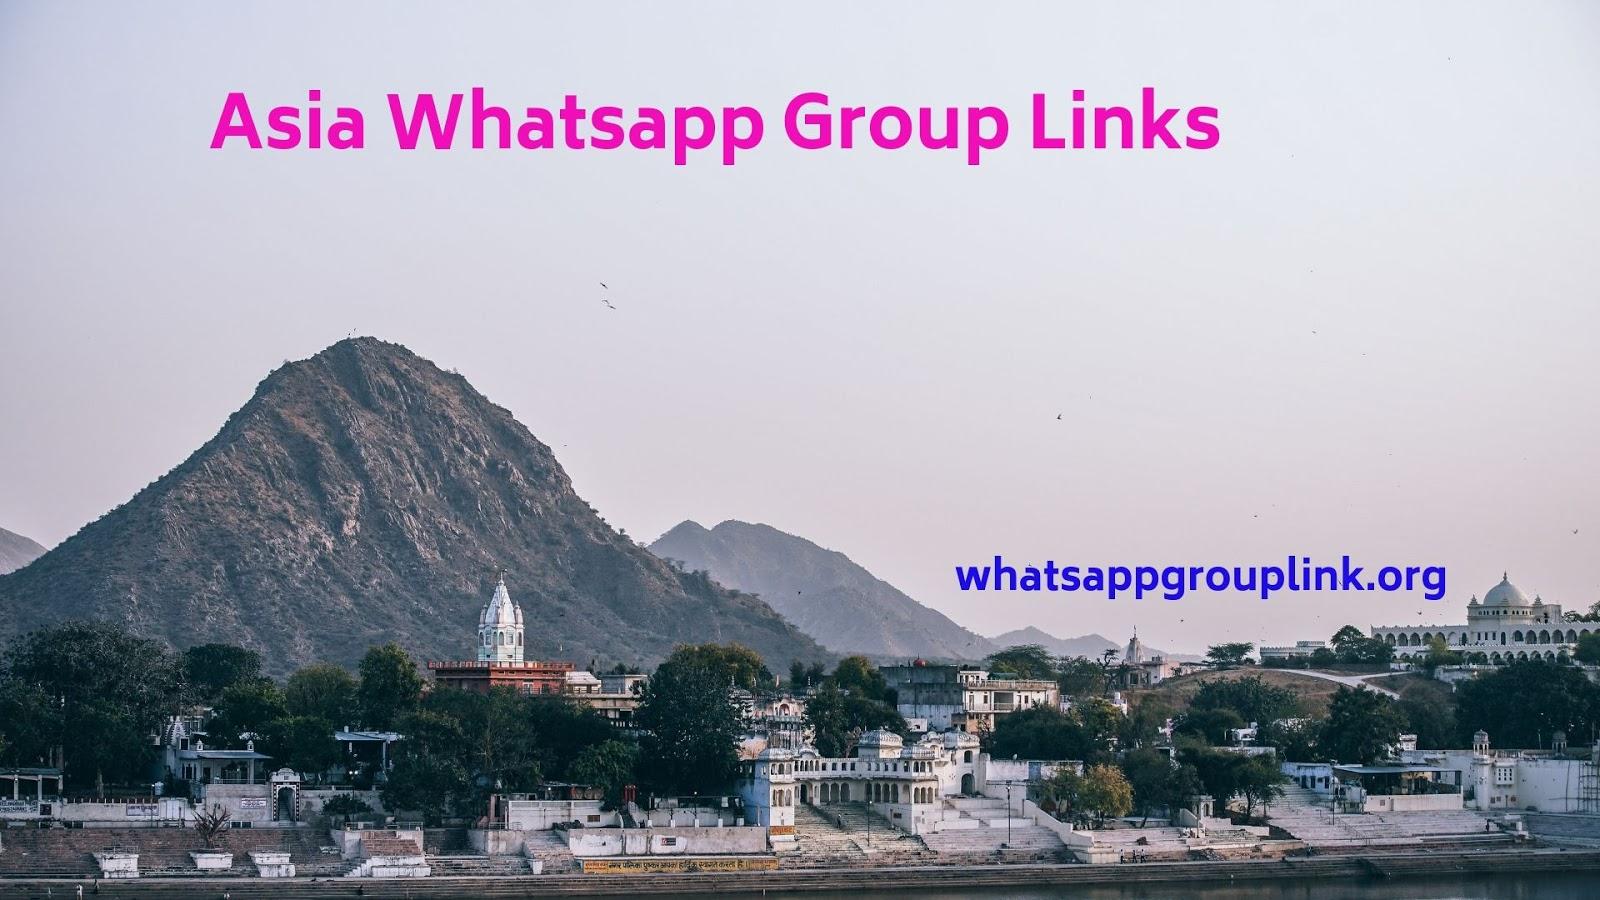 Whatsapp Group Link: Asia Whatsapp Group Links